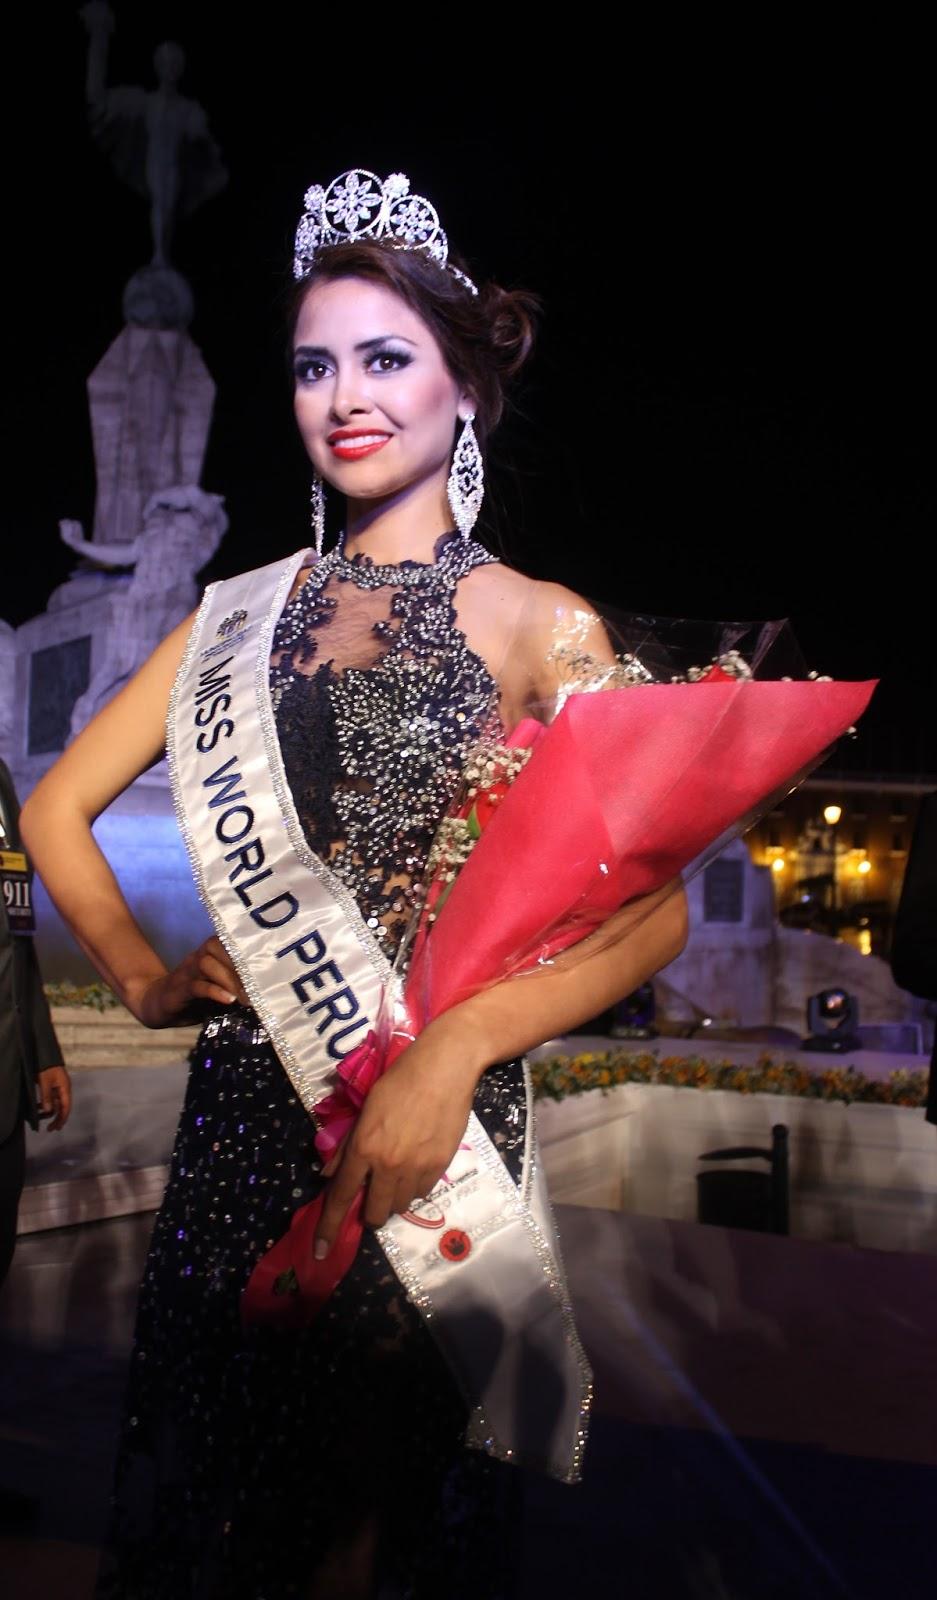 pierina sue wong mori, miss mundo peru 2016. - Página 2 Yk33y9np